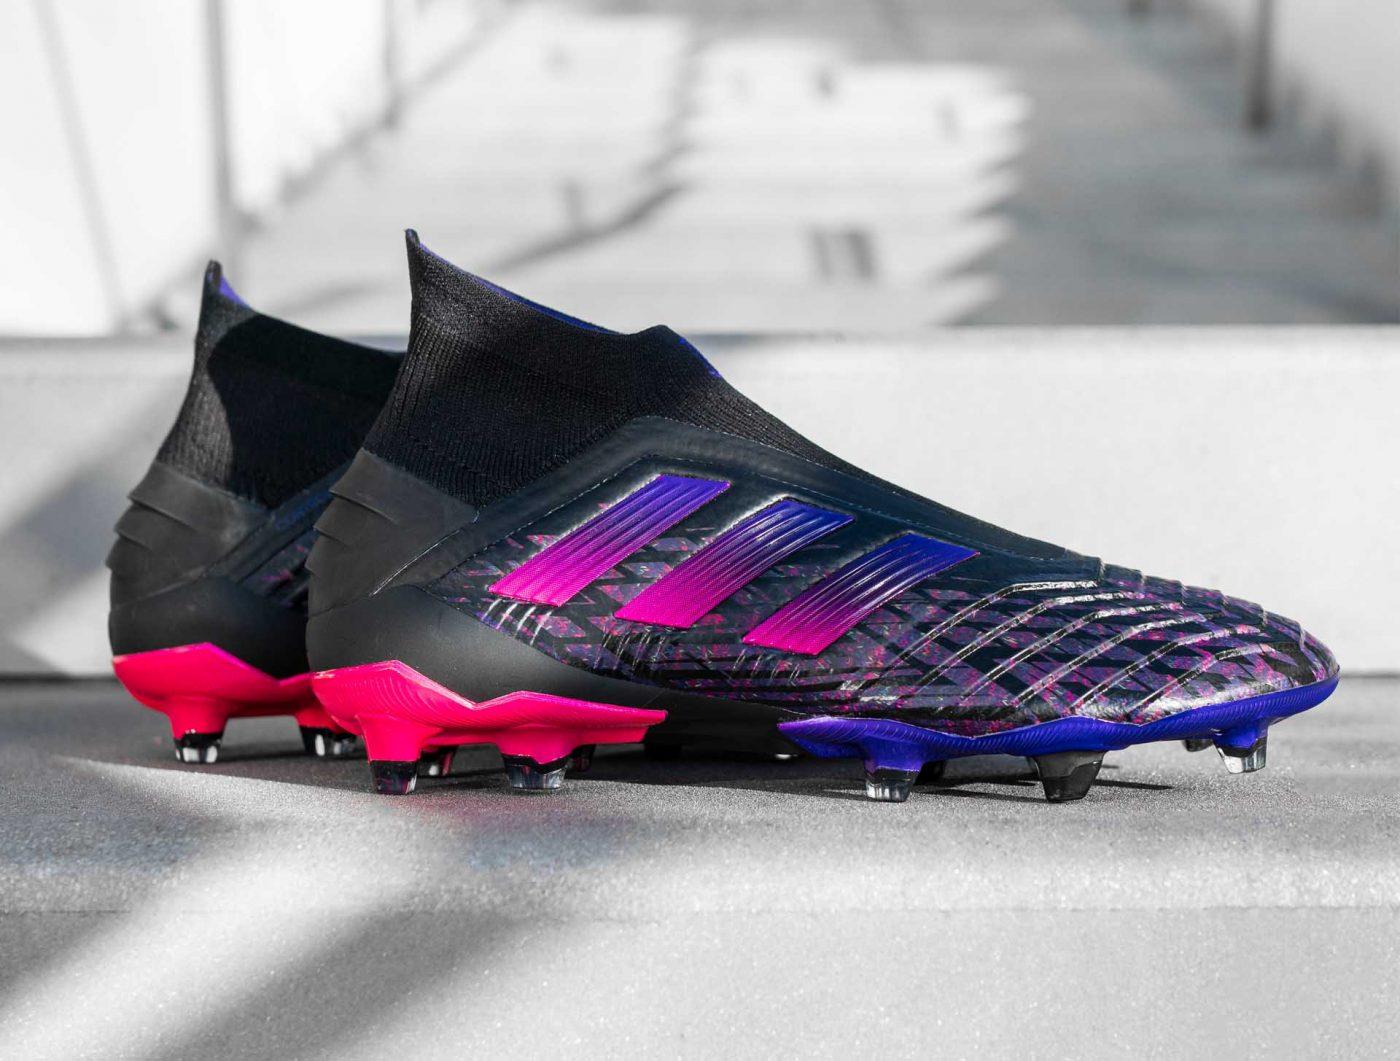 chaussures-paul-pogba-collection-adidas-saison-6